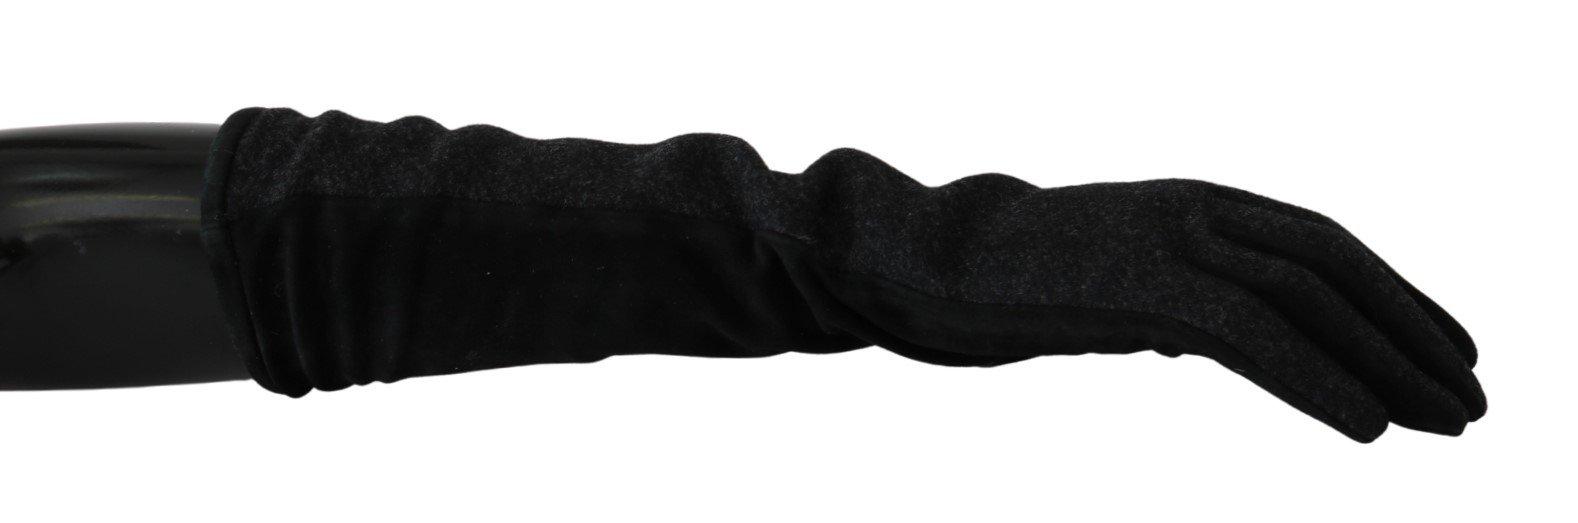 Dolce & Gabbana Women's Mid Arm Length Mittens Gloves Black LB1021 - 7.5|S